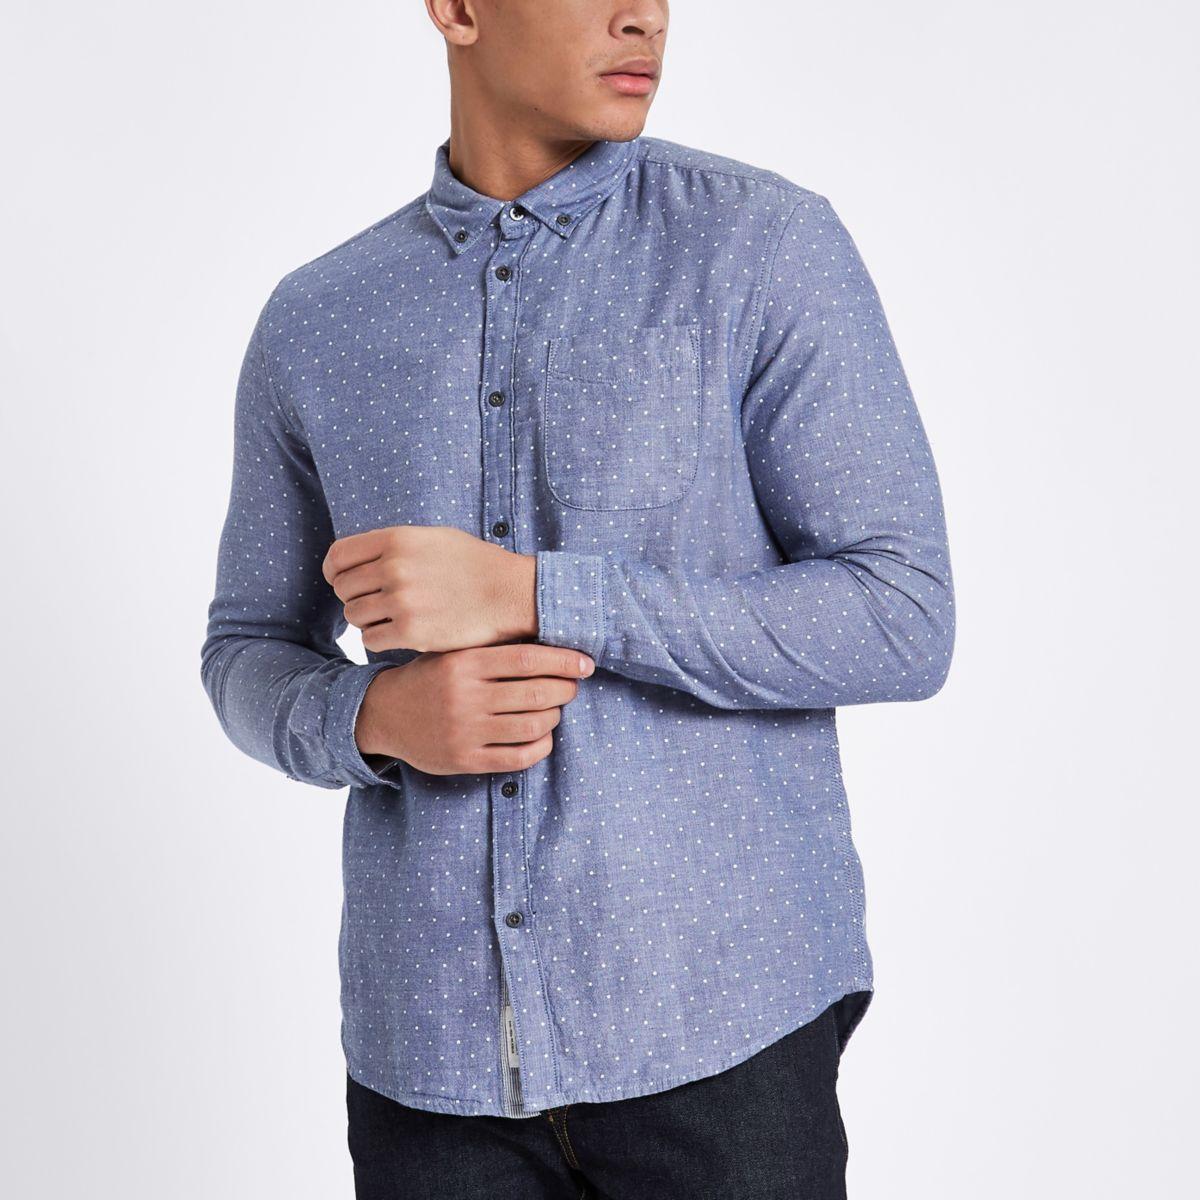 Light blue polka dot long sleeve shirt